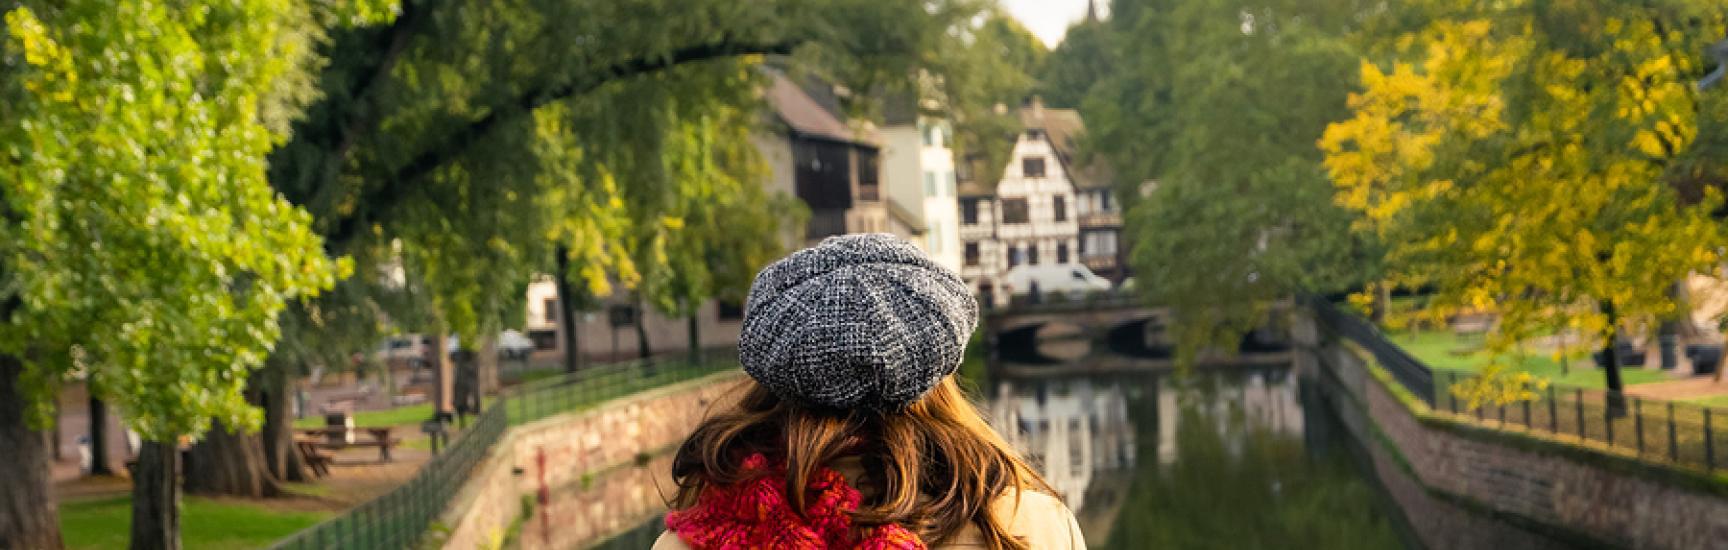 woman relaxing on bridge